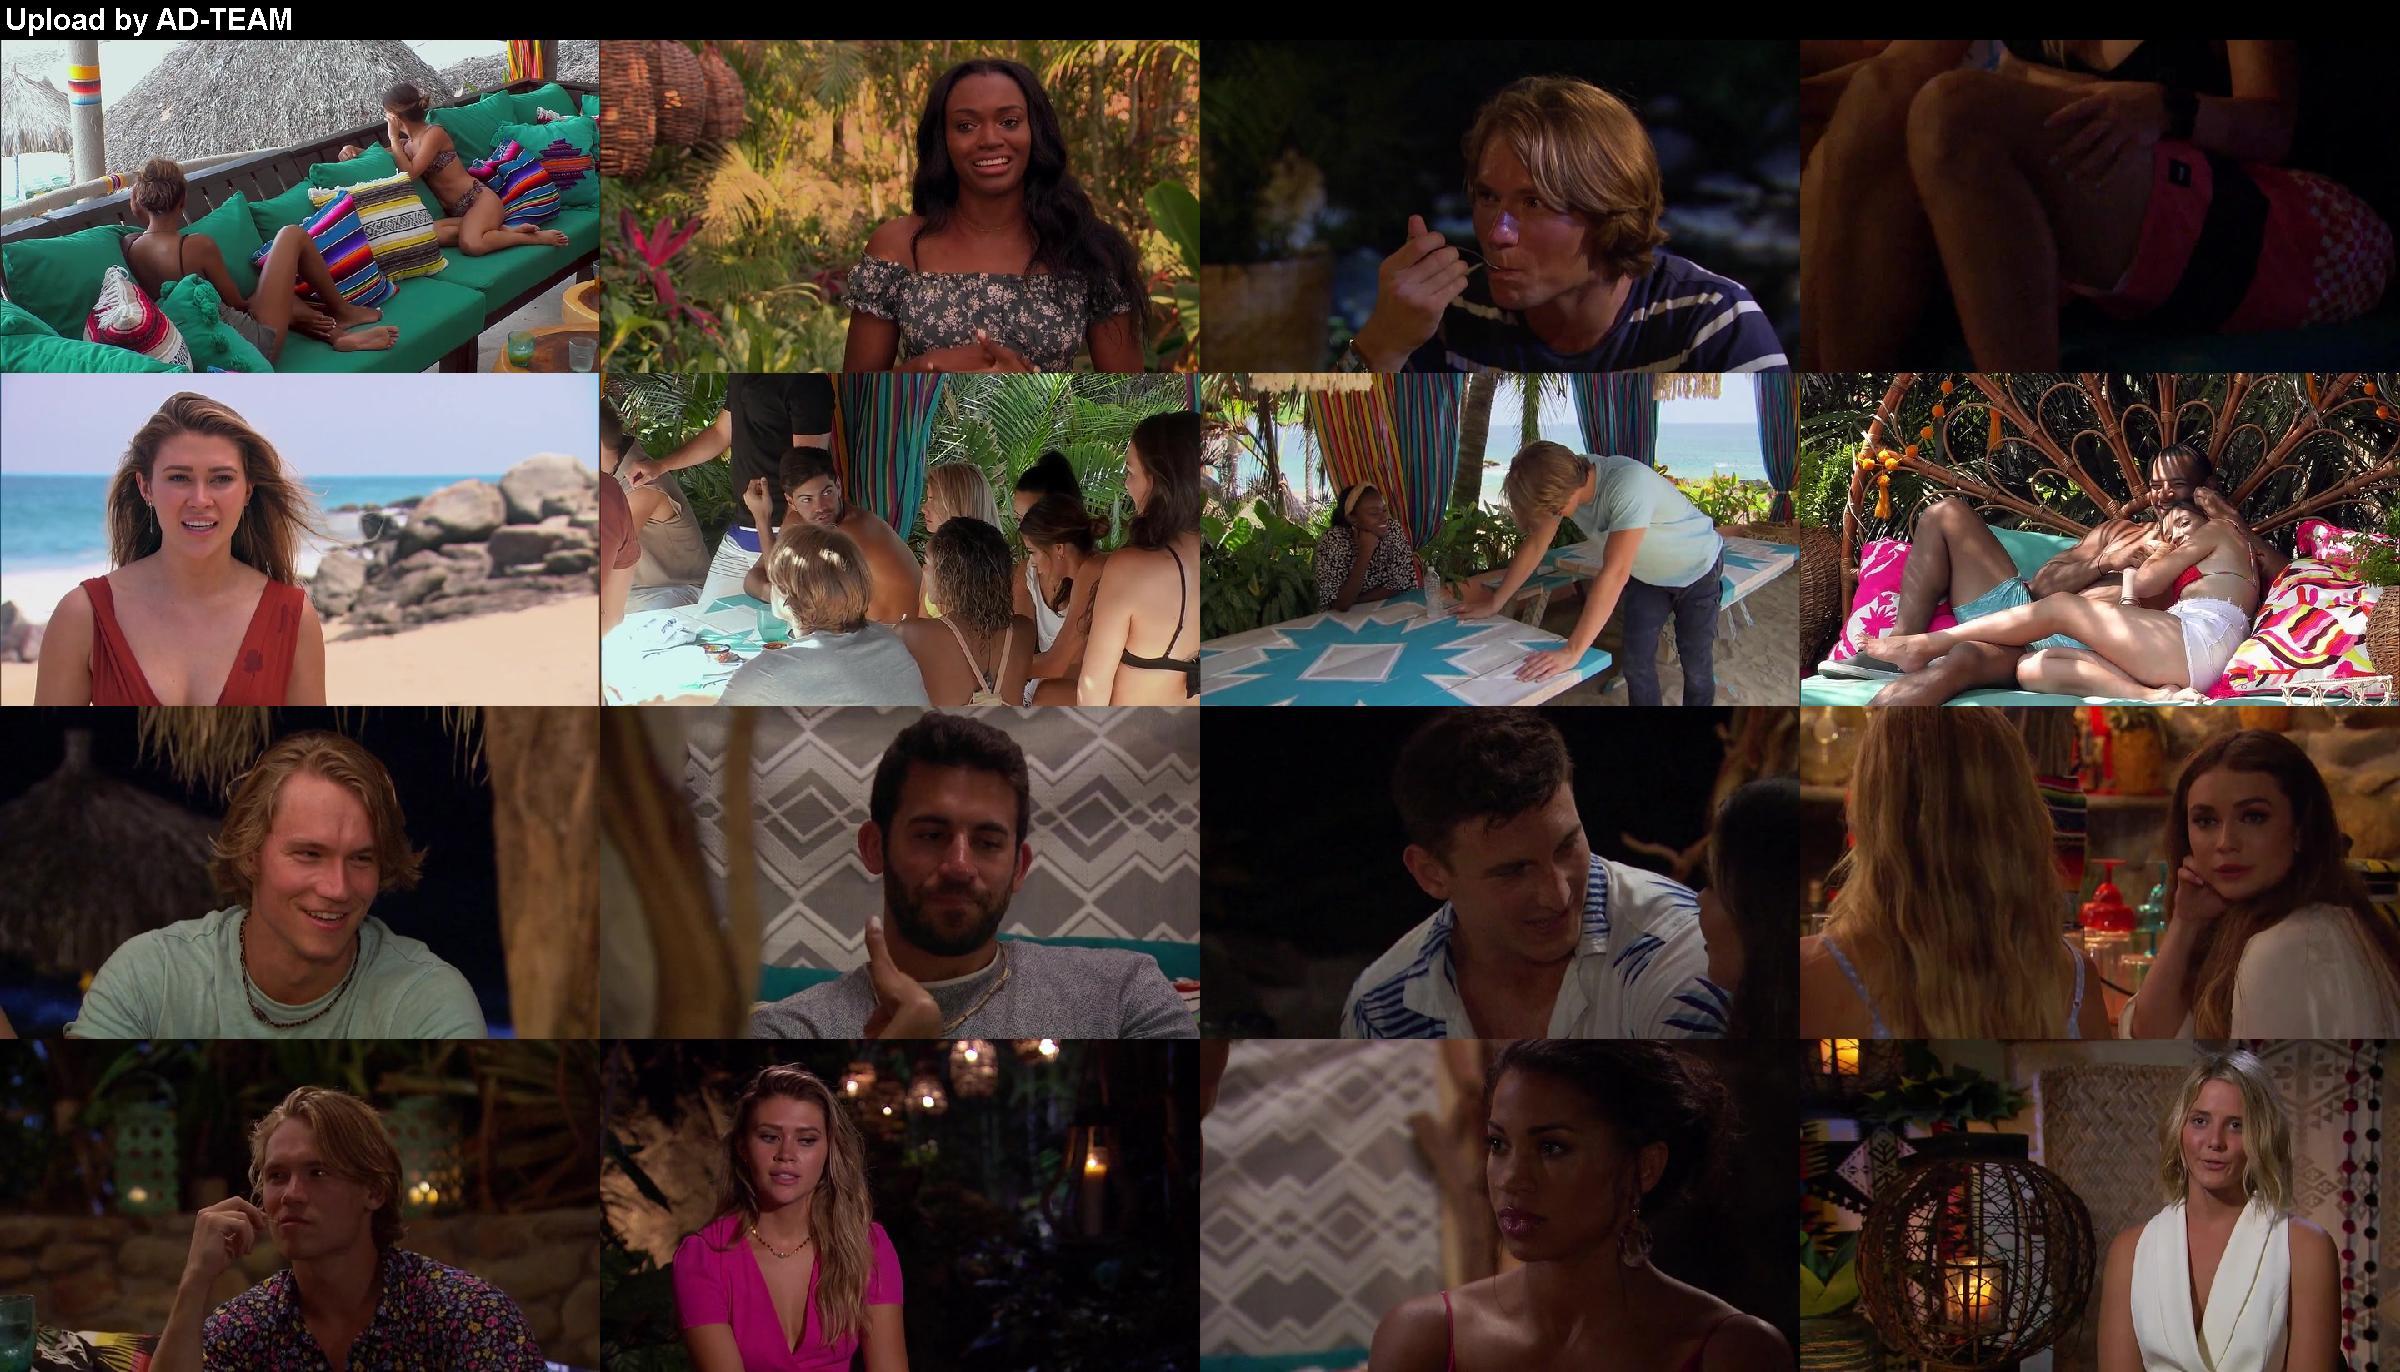 Bachelor In Paradise S06e07 Web X264-phoenix